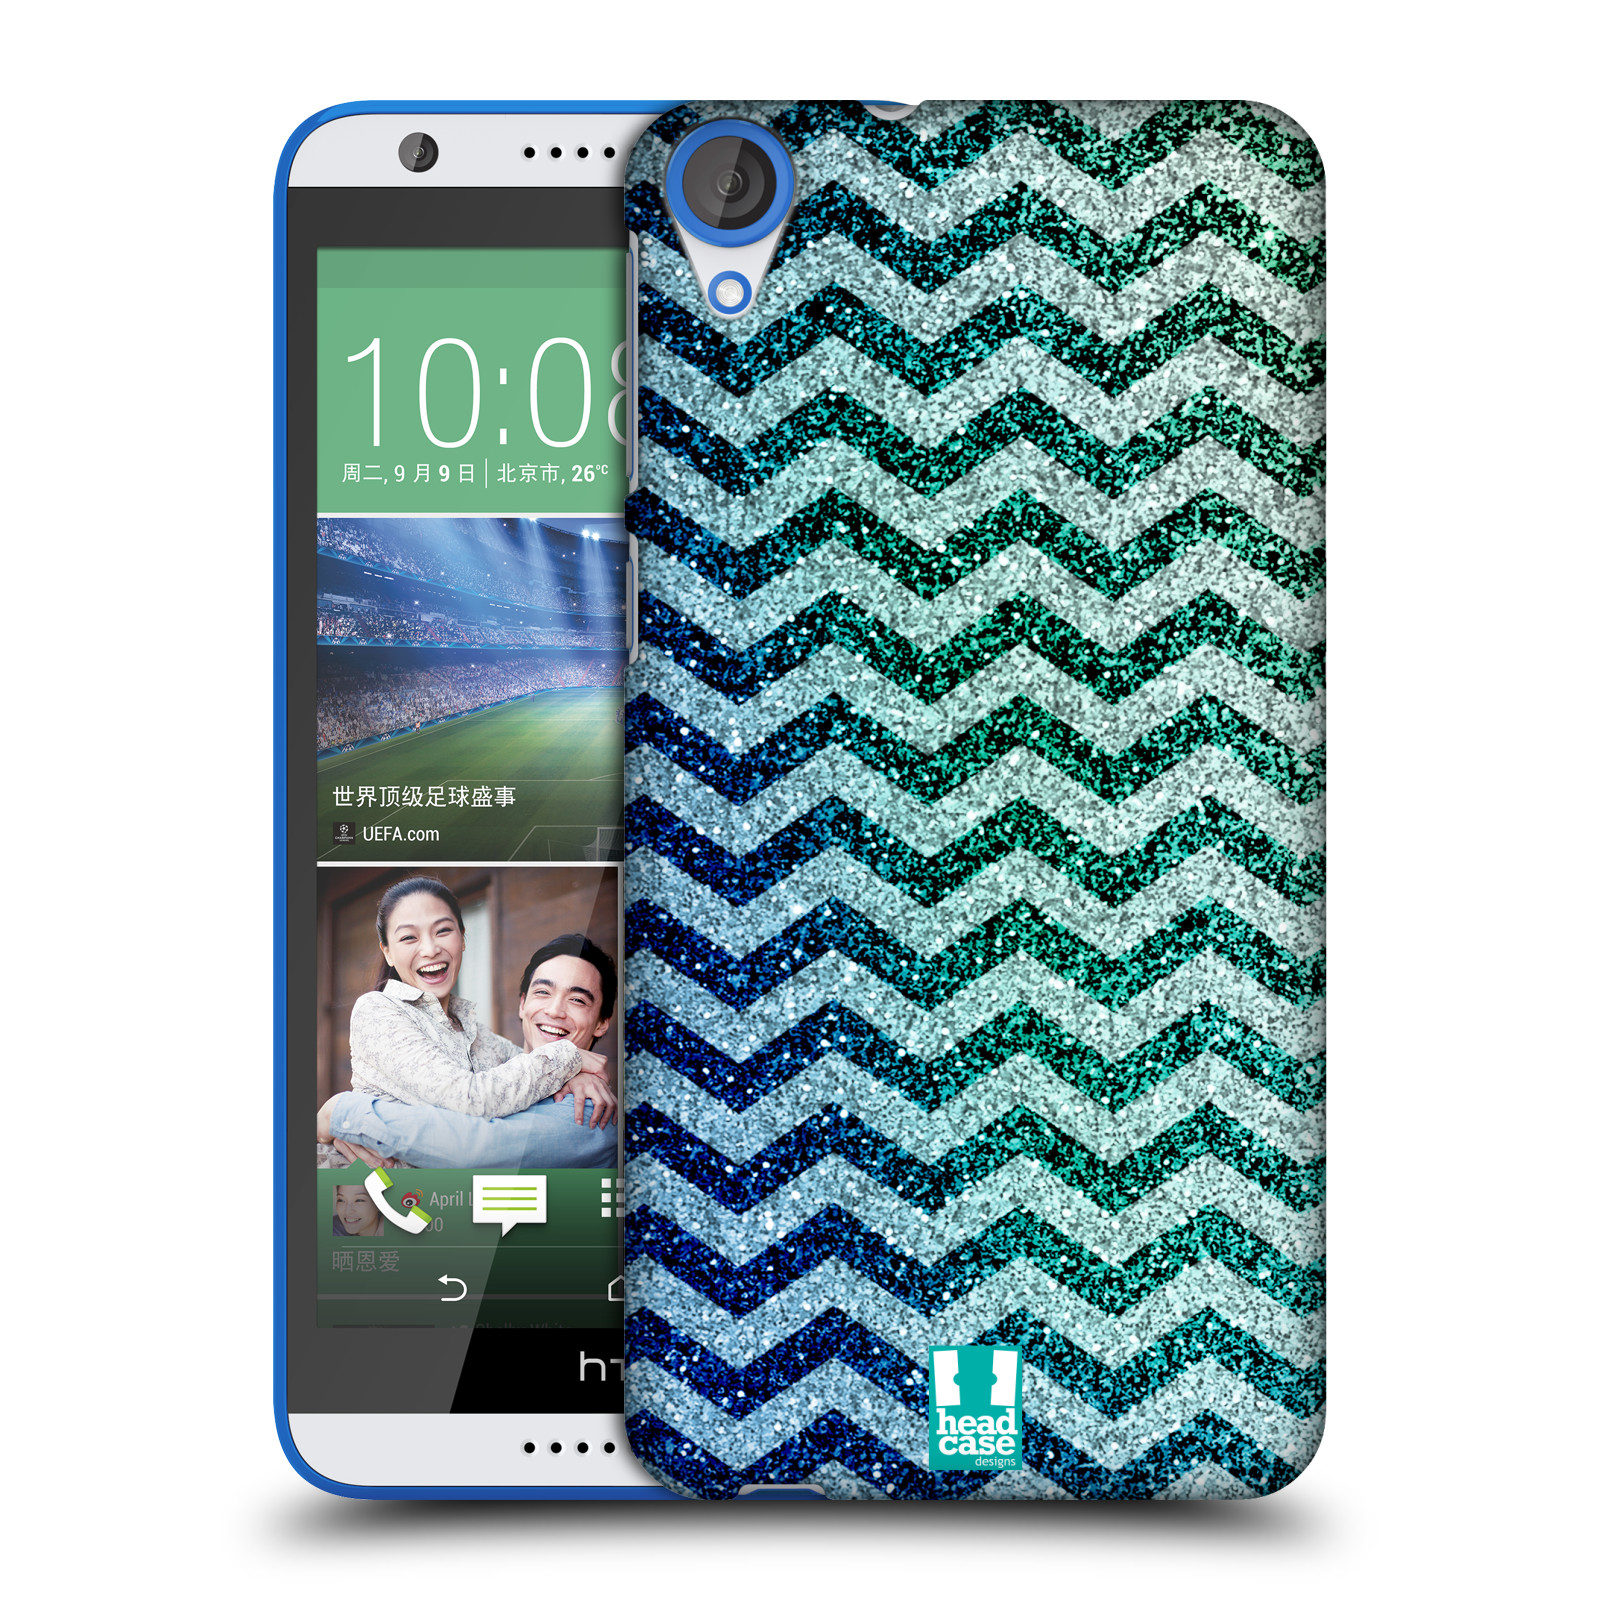 HEAD CASE DESIGNS TREND MIX CASE COVER FOR HTC DESIRE 820